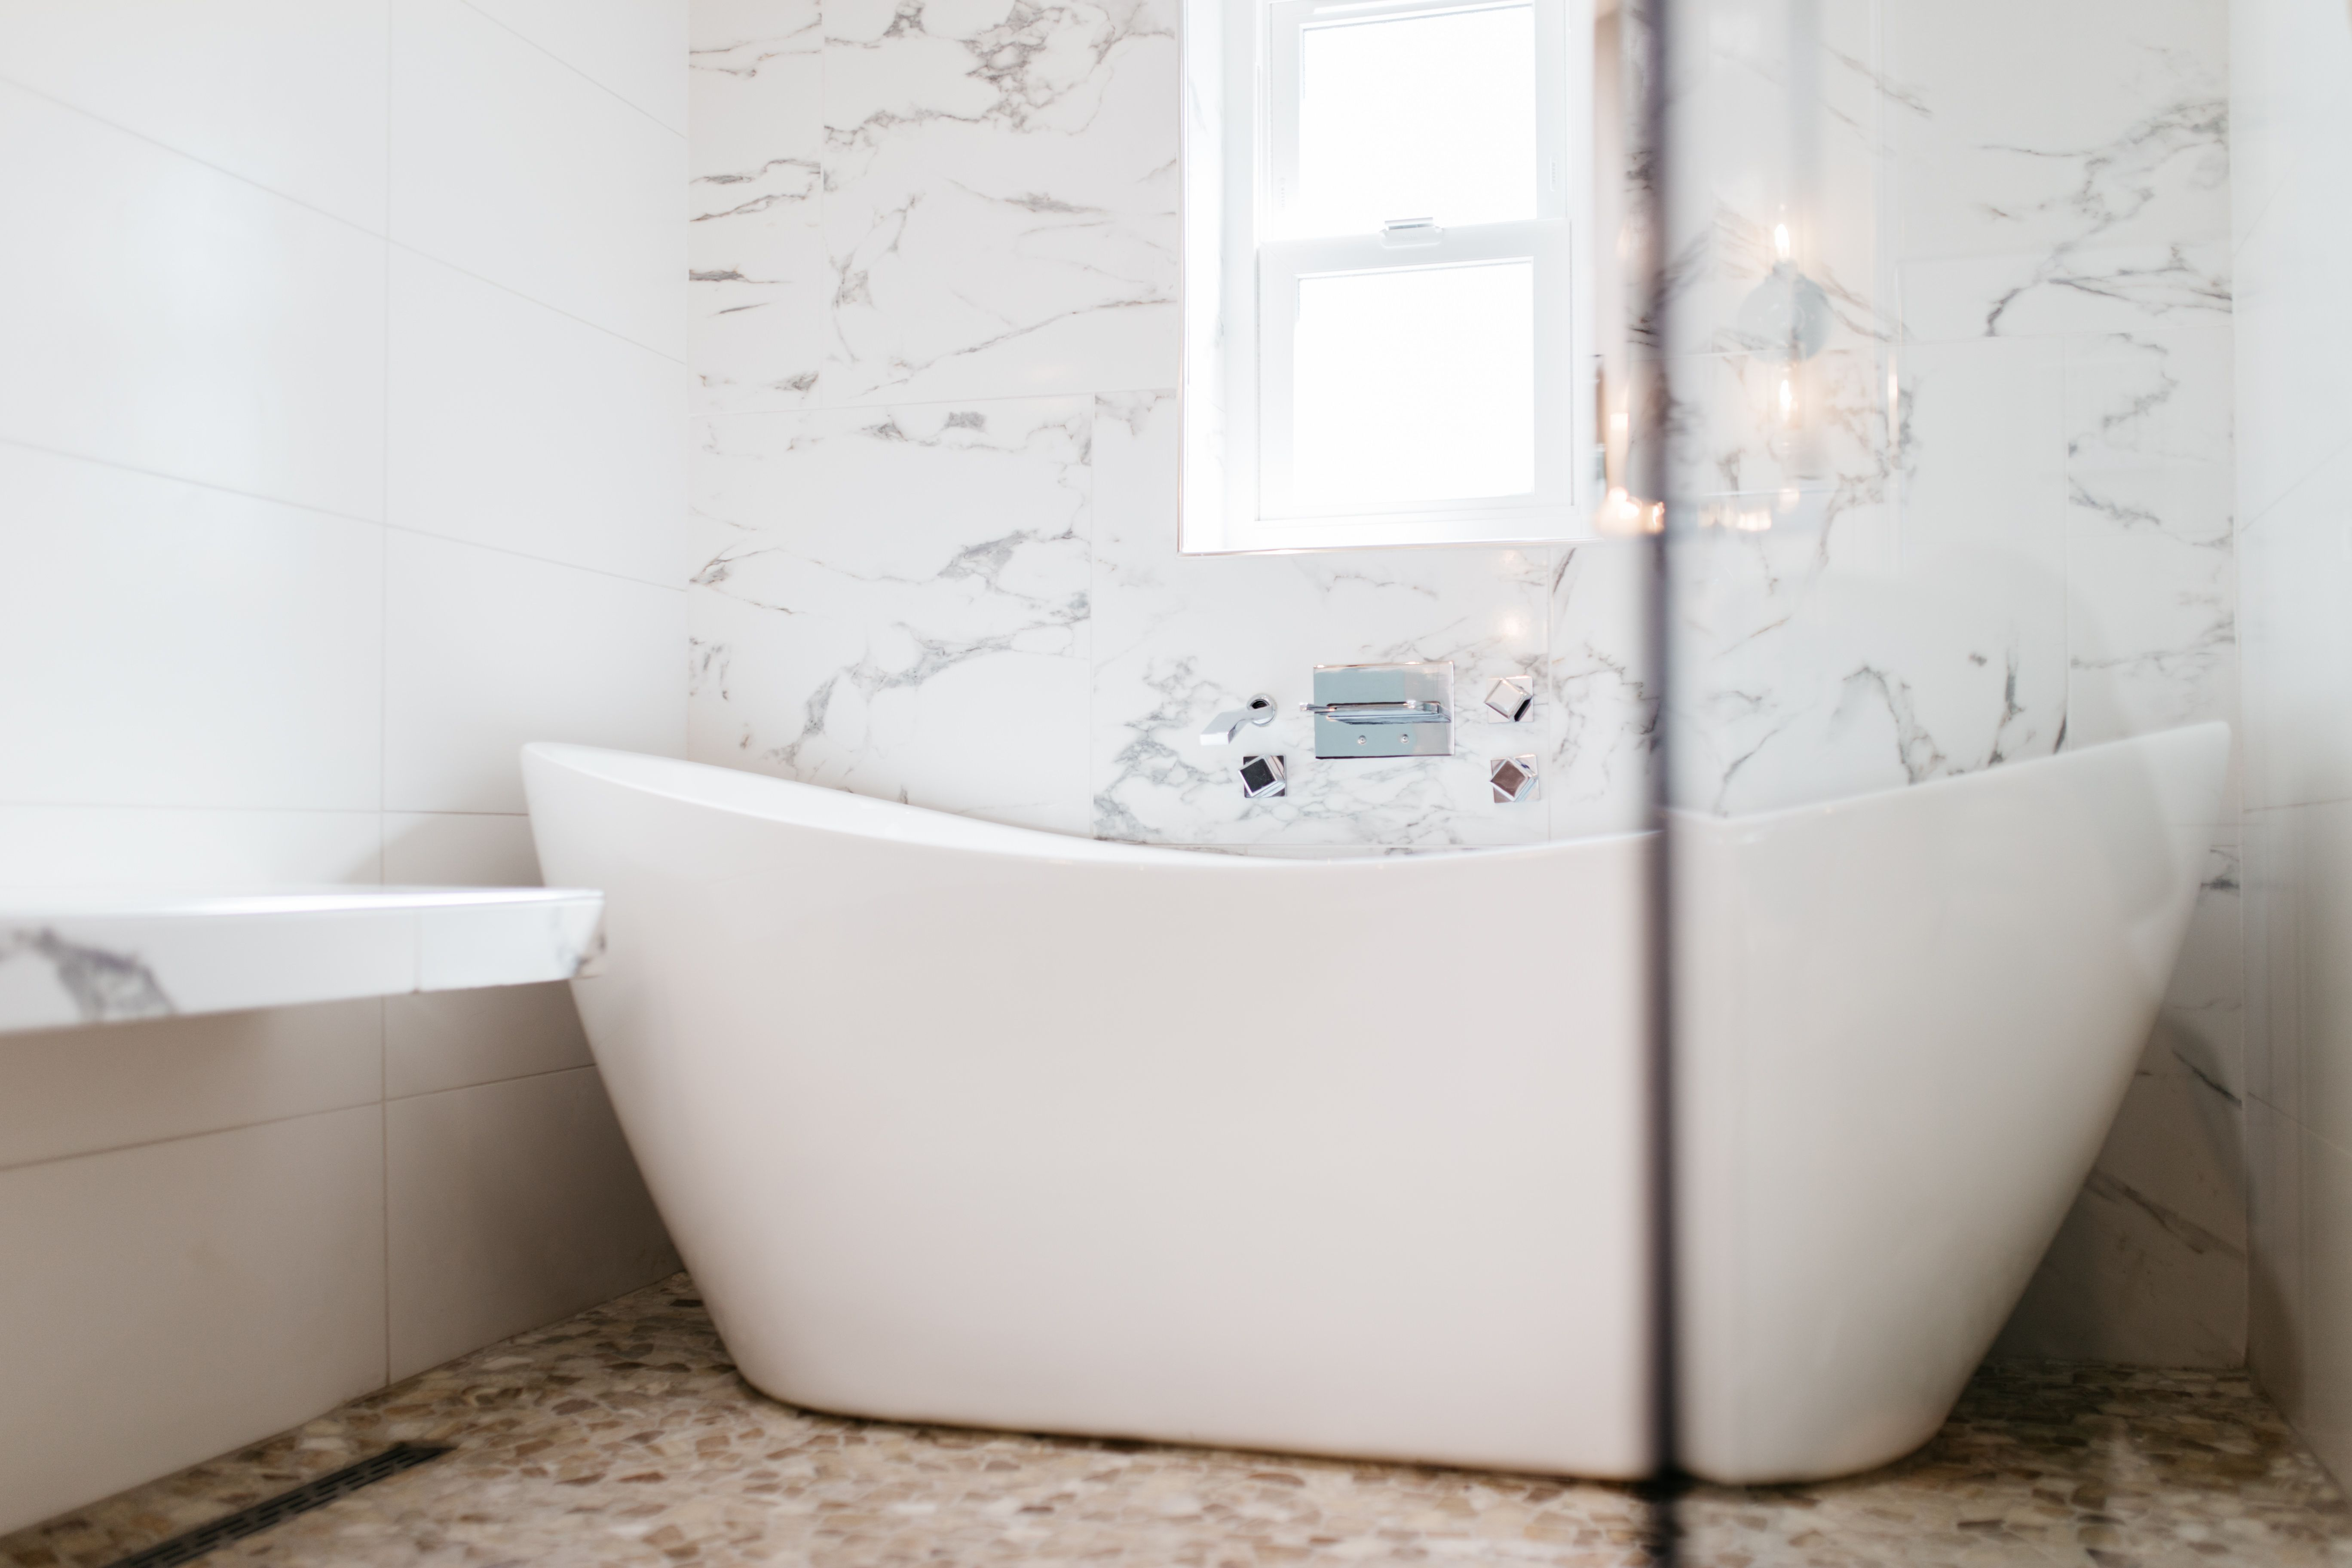 furniture bathroom diego bc vancouver decoration francisco stores amazing vanities san fresh gallery modern